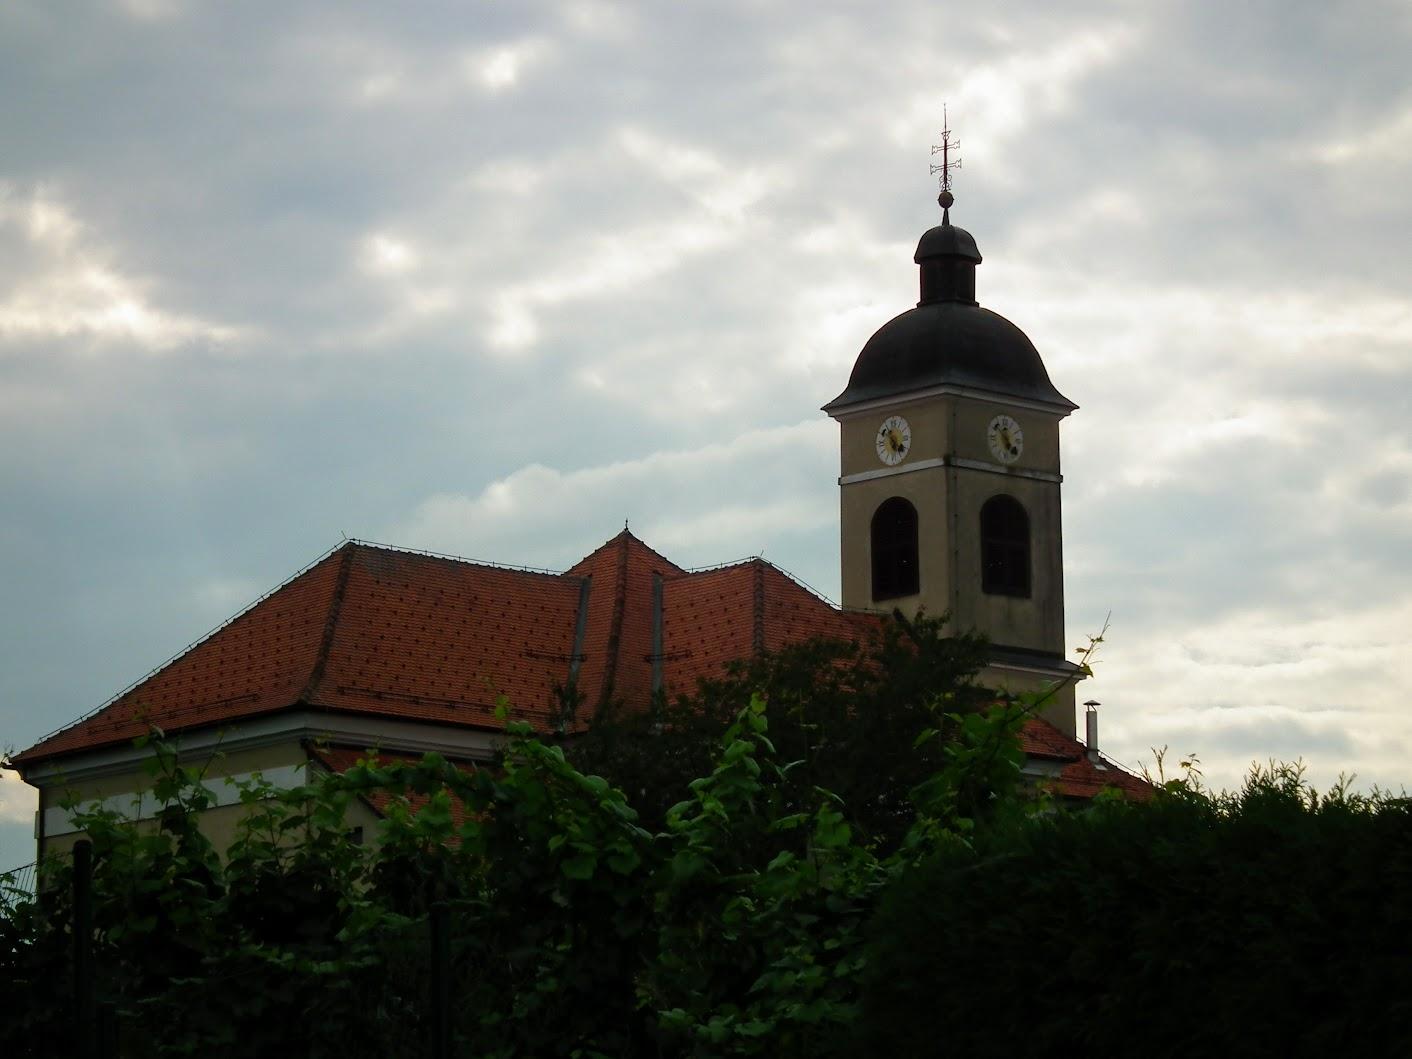 Kapelski vrh - Cerkev svete Marije Magdalene (Szent Mária Magdolna rk. templom)